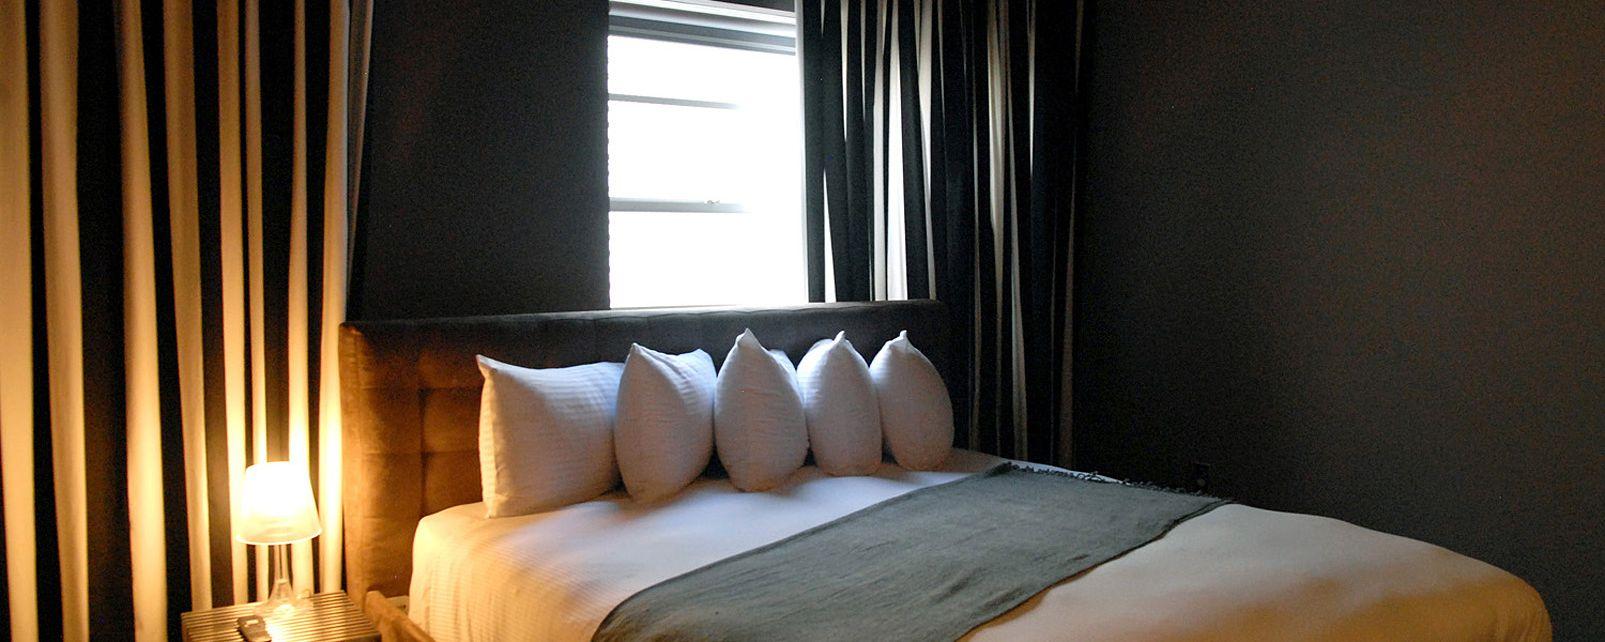 Hotel Metropole Suites